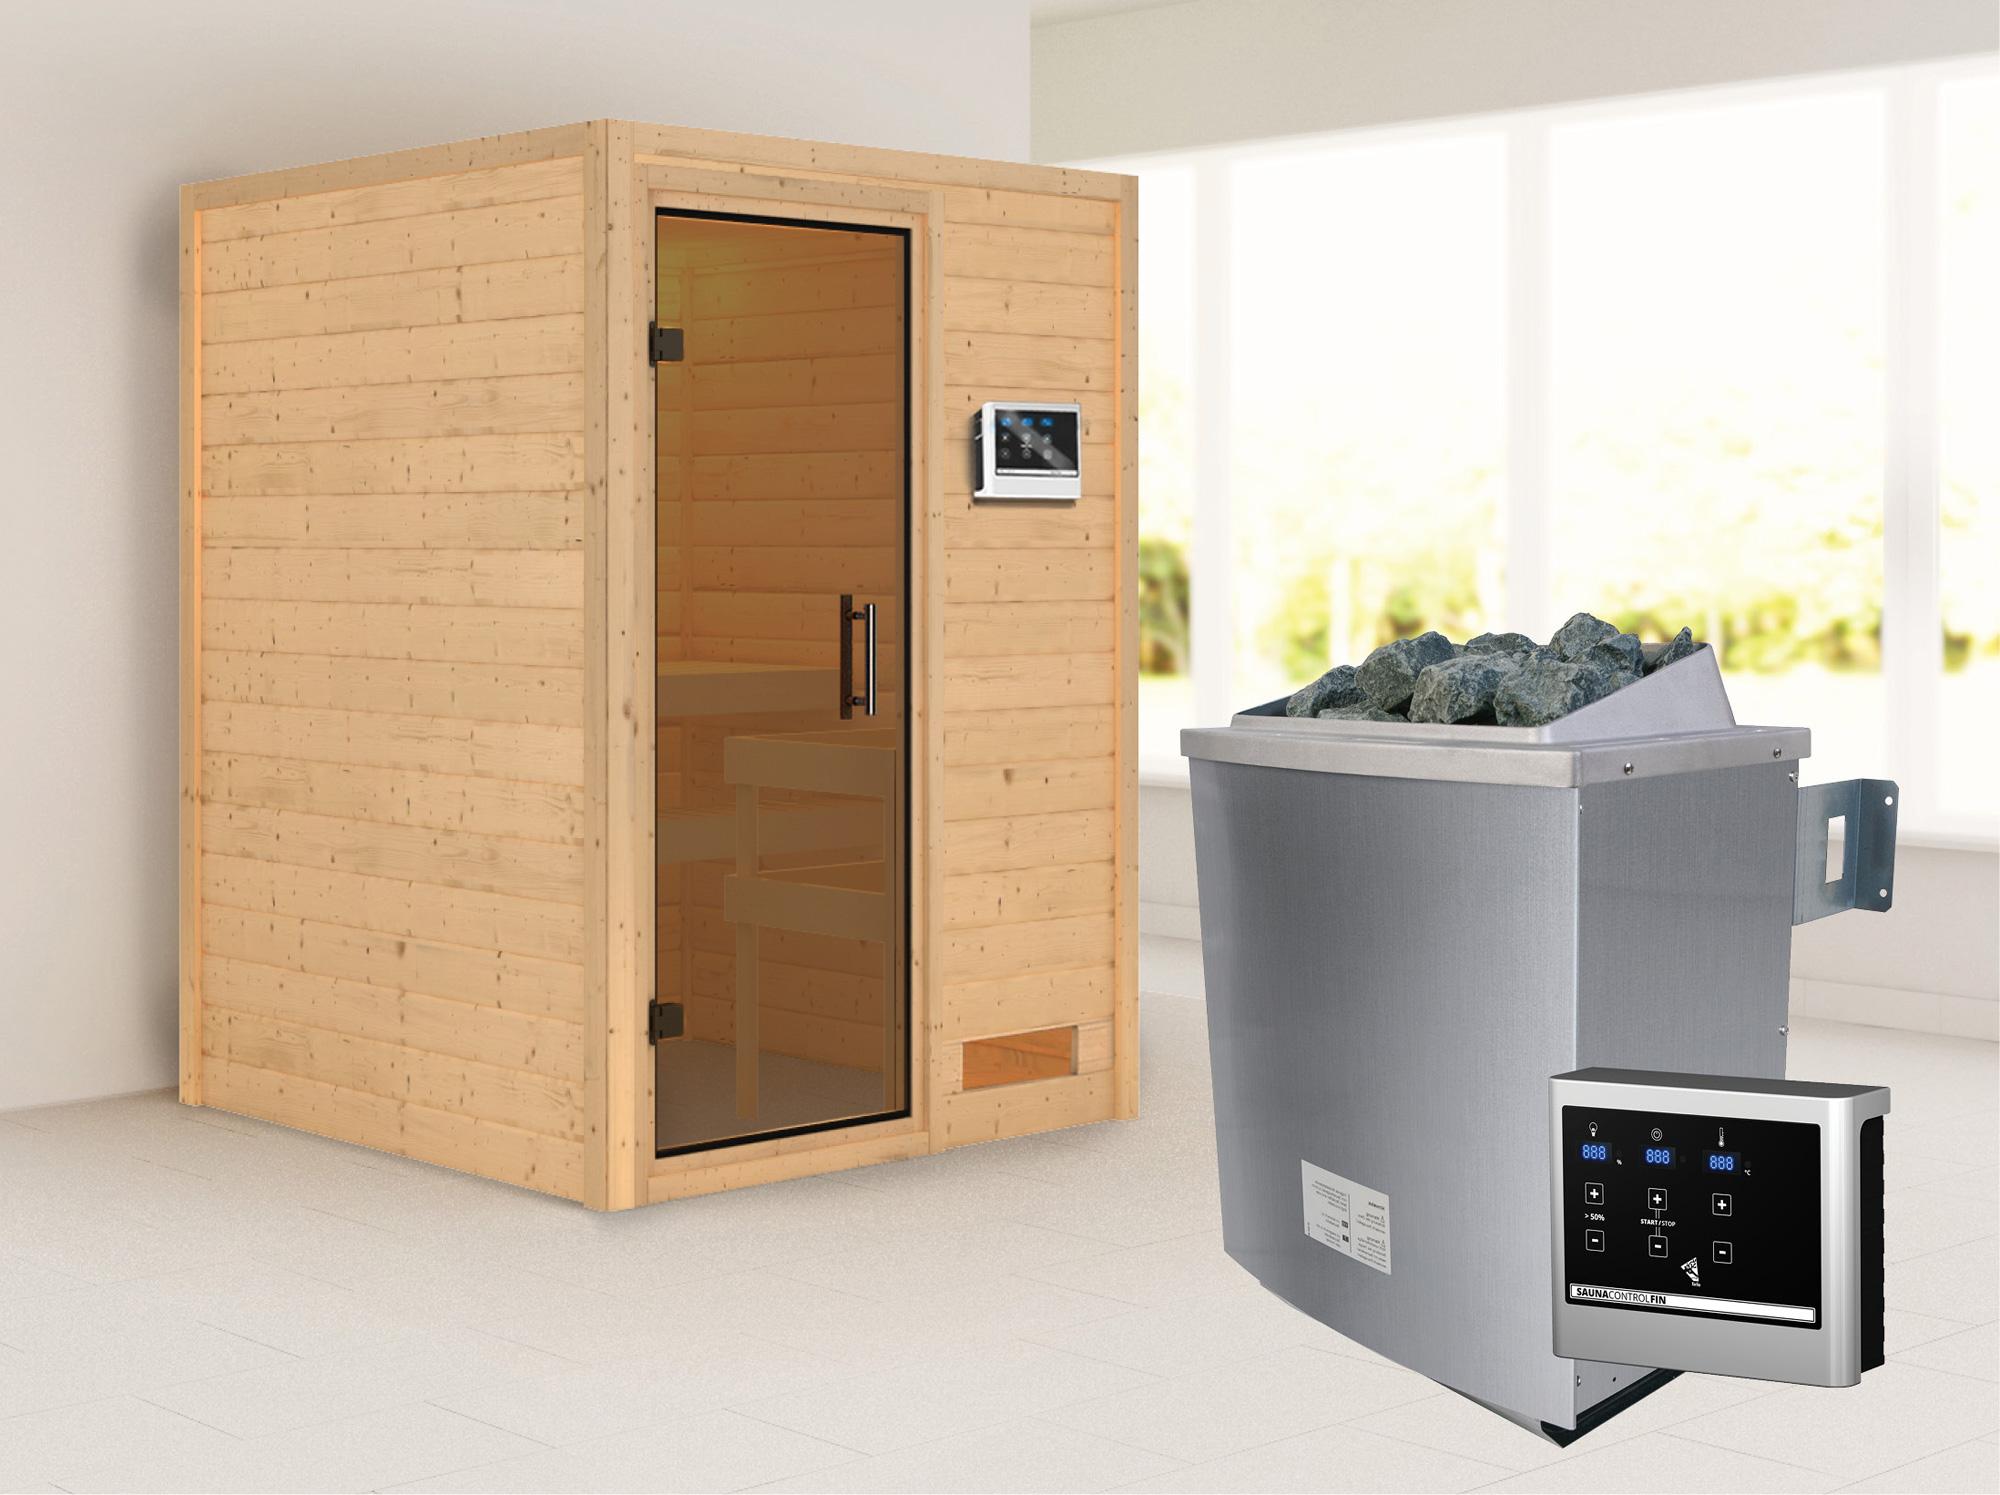 Woodfeeling Sauna Svenja 38mm mit Saunaofen 9 kW moderne Tür Bild 1